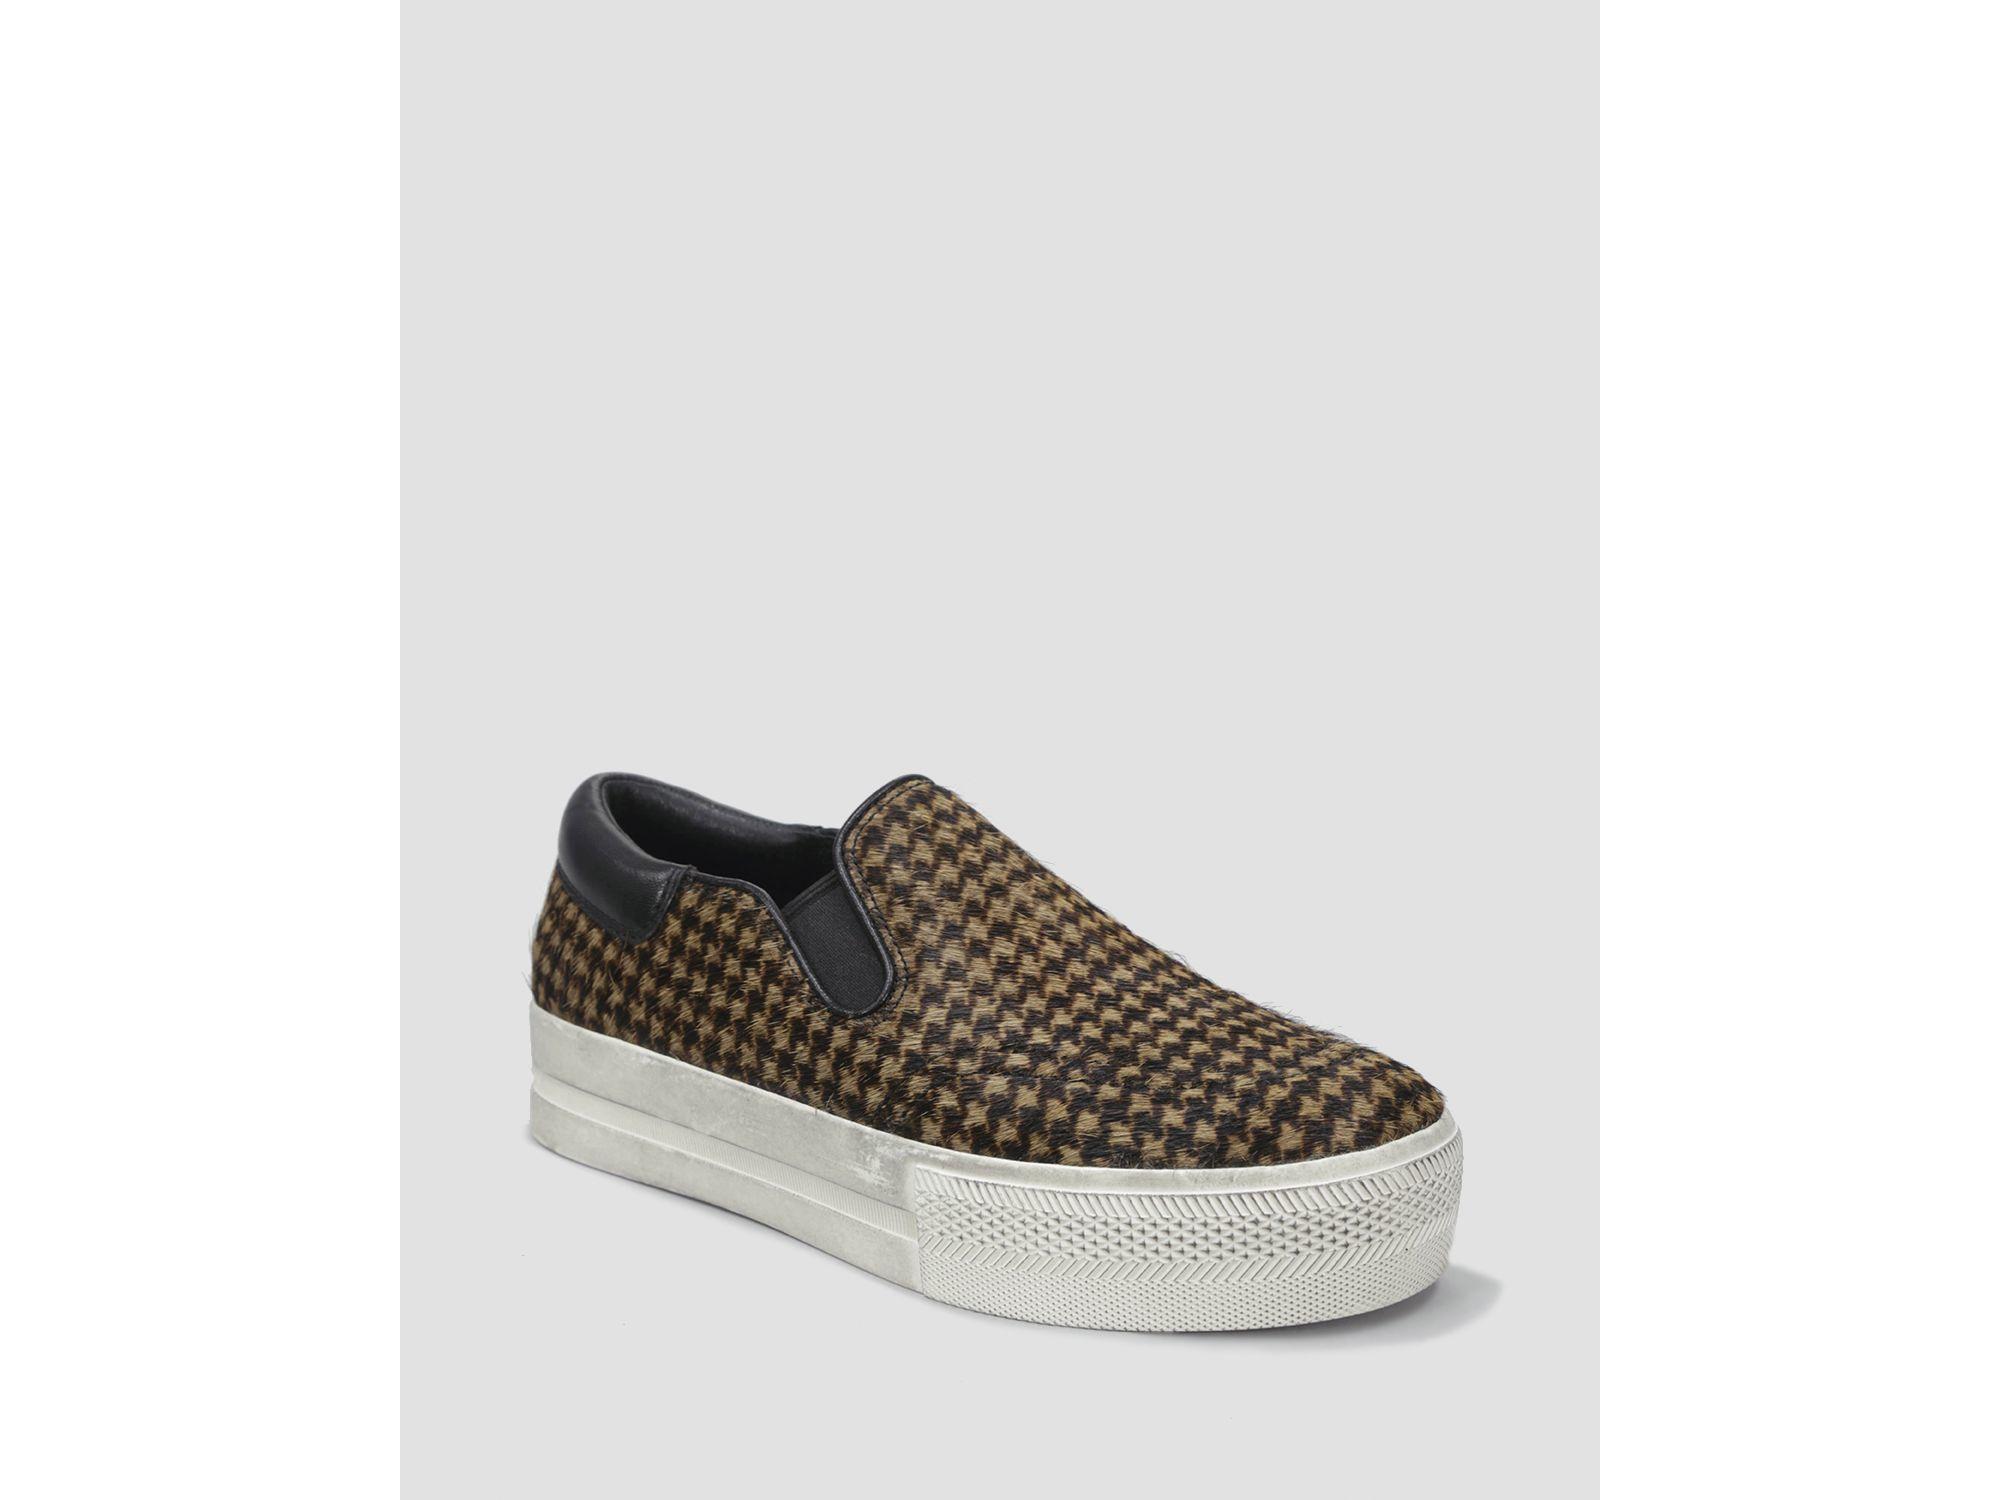 766fd5f03cc Ash Slip On Platform Sneakers - Jam Leopard Print in Black - Lyst